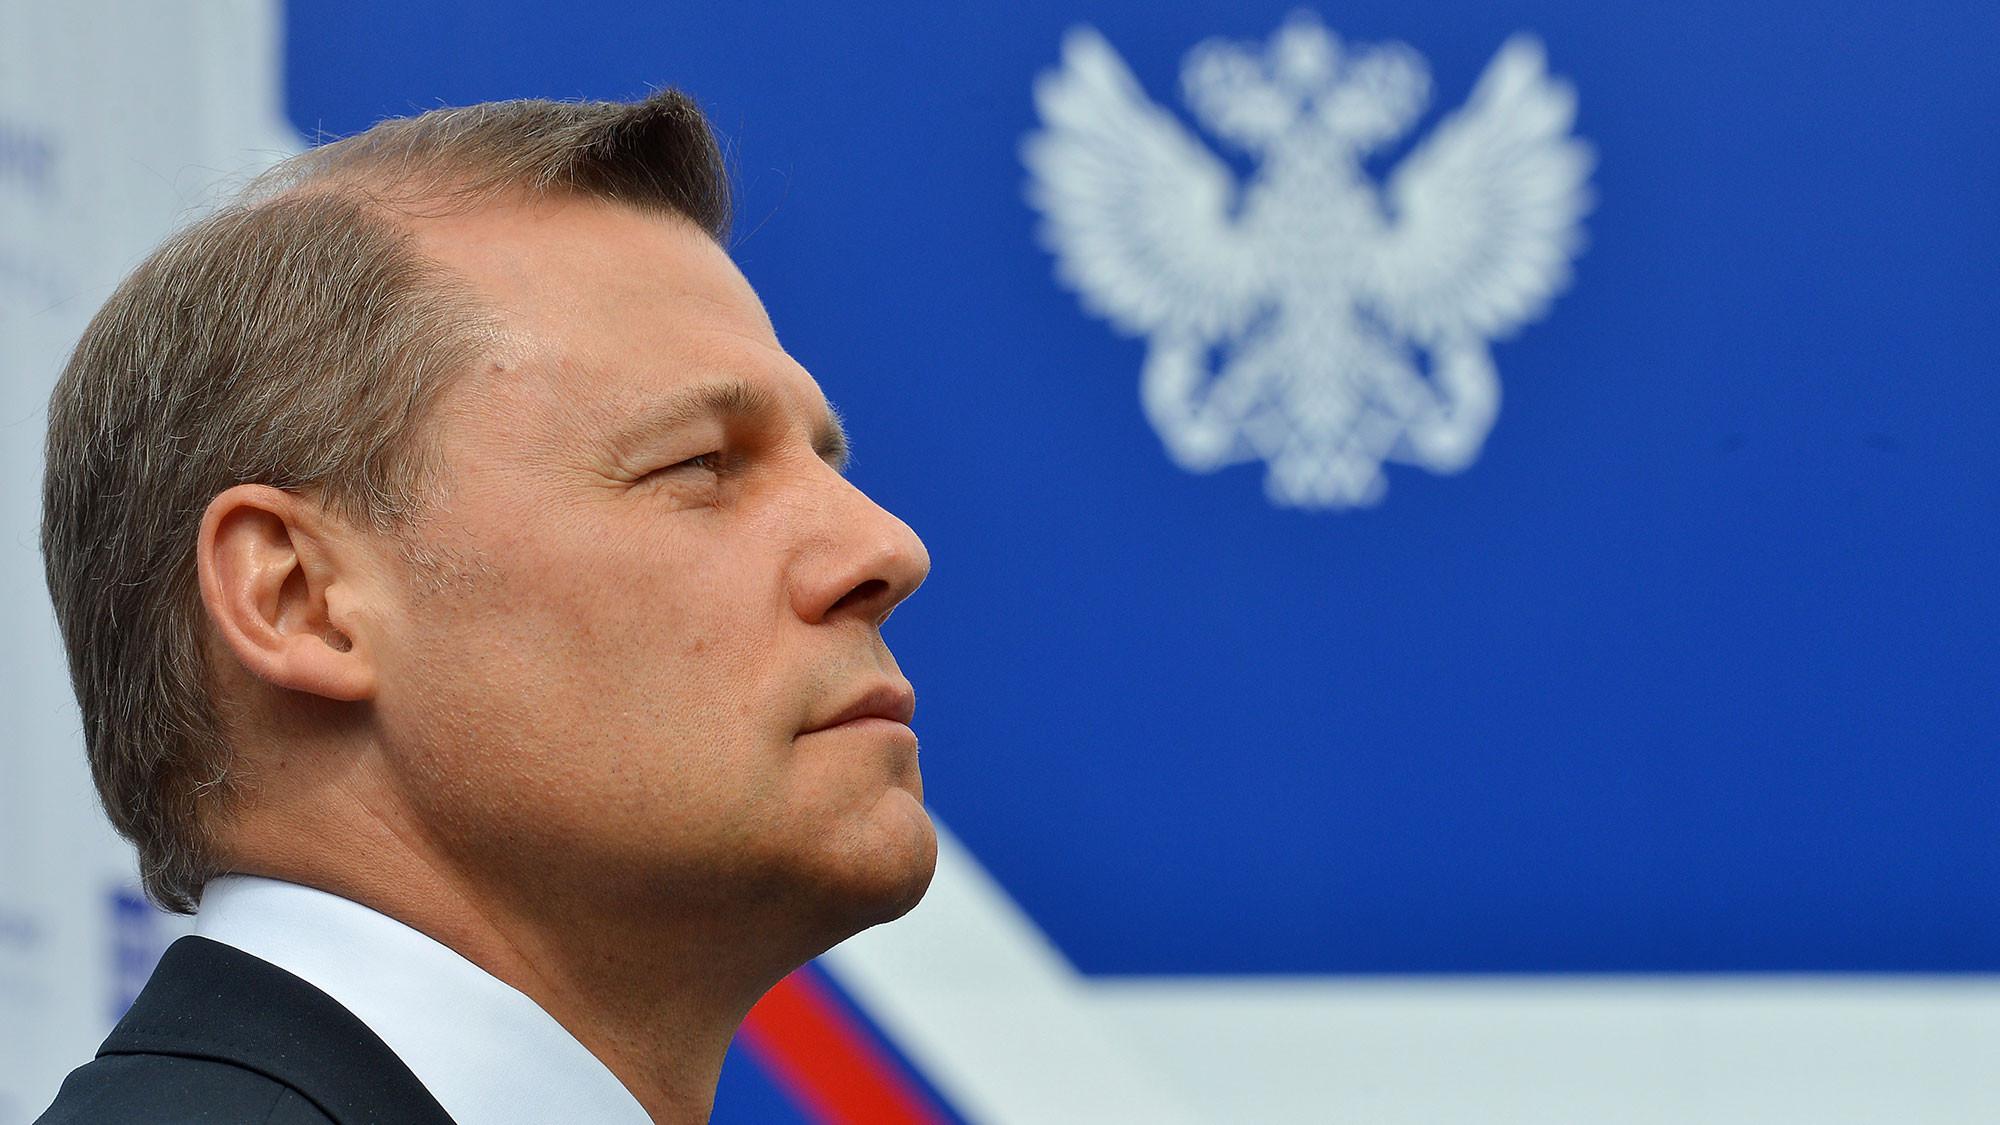 <p>Фото: &copy; РИА Новости /&nbsp;Рамиль Ситдиков</p>